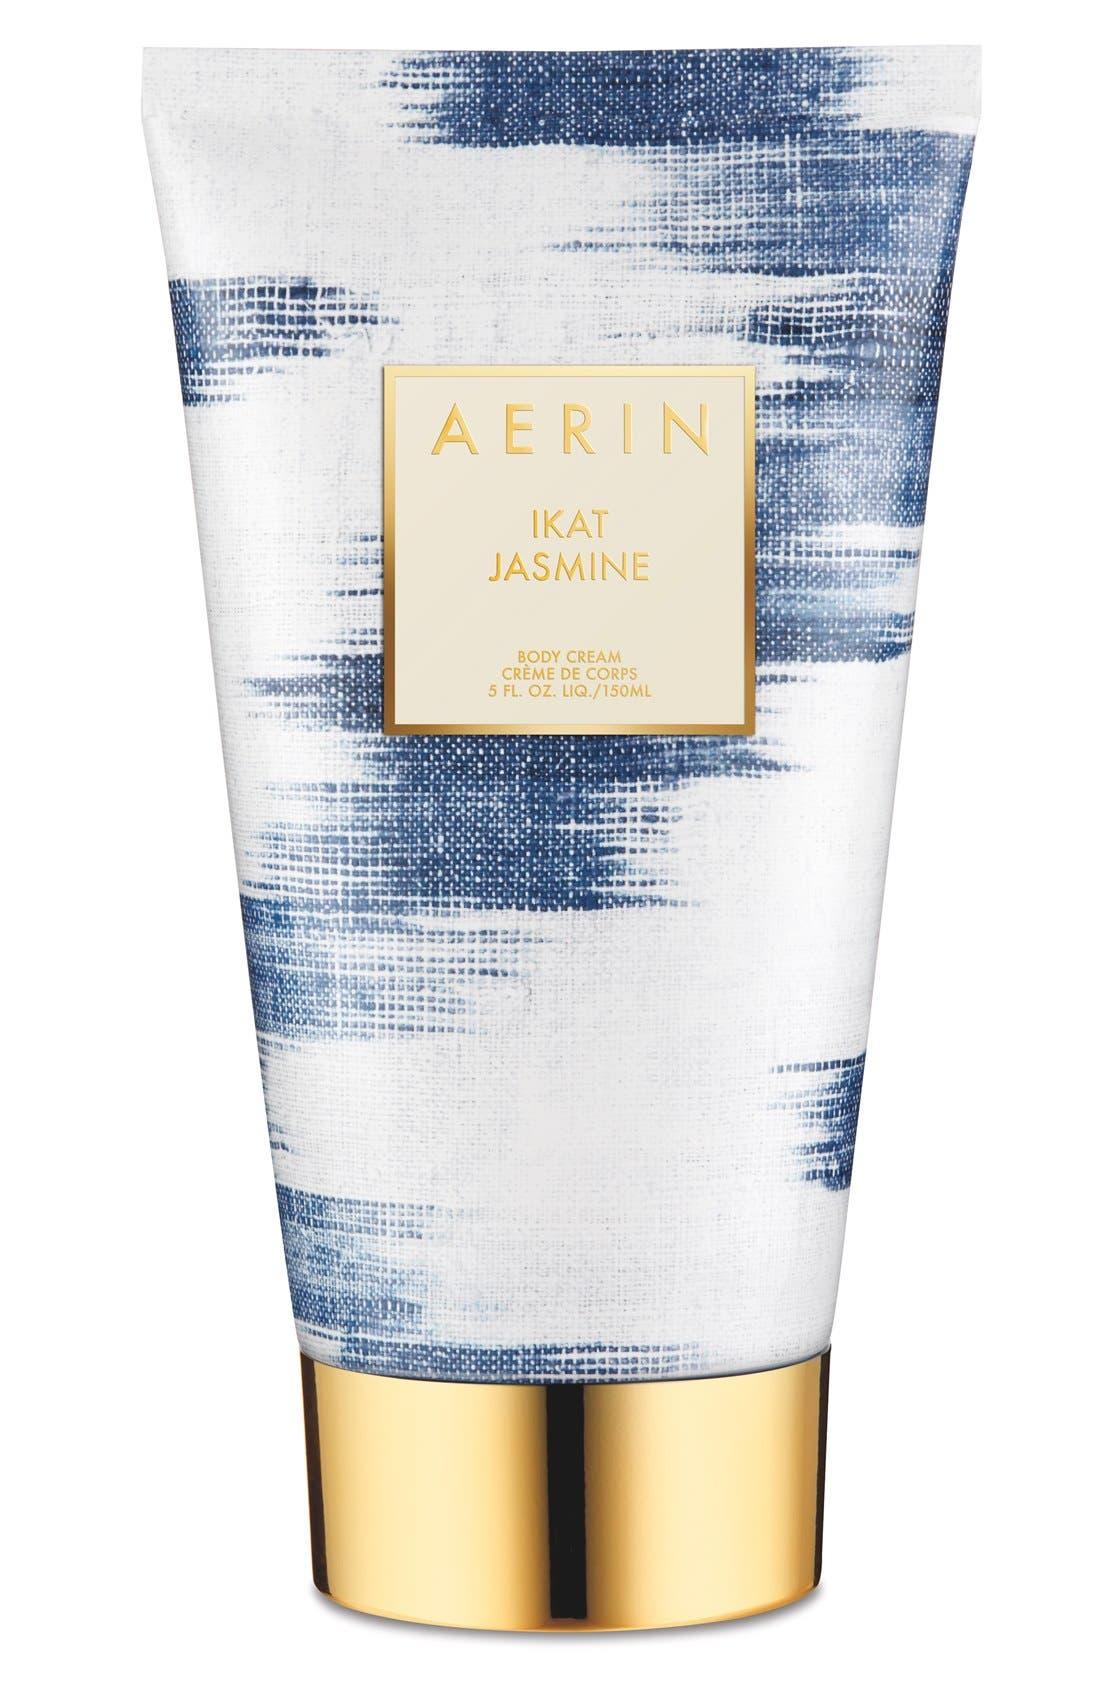 AERIN Beauty Ikat Jasmine Body Cream,                         Main,                         color, NO COLOR